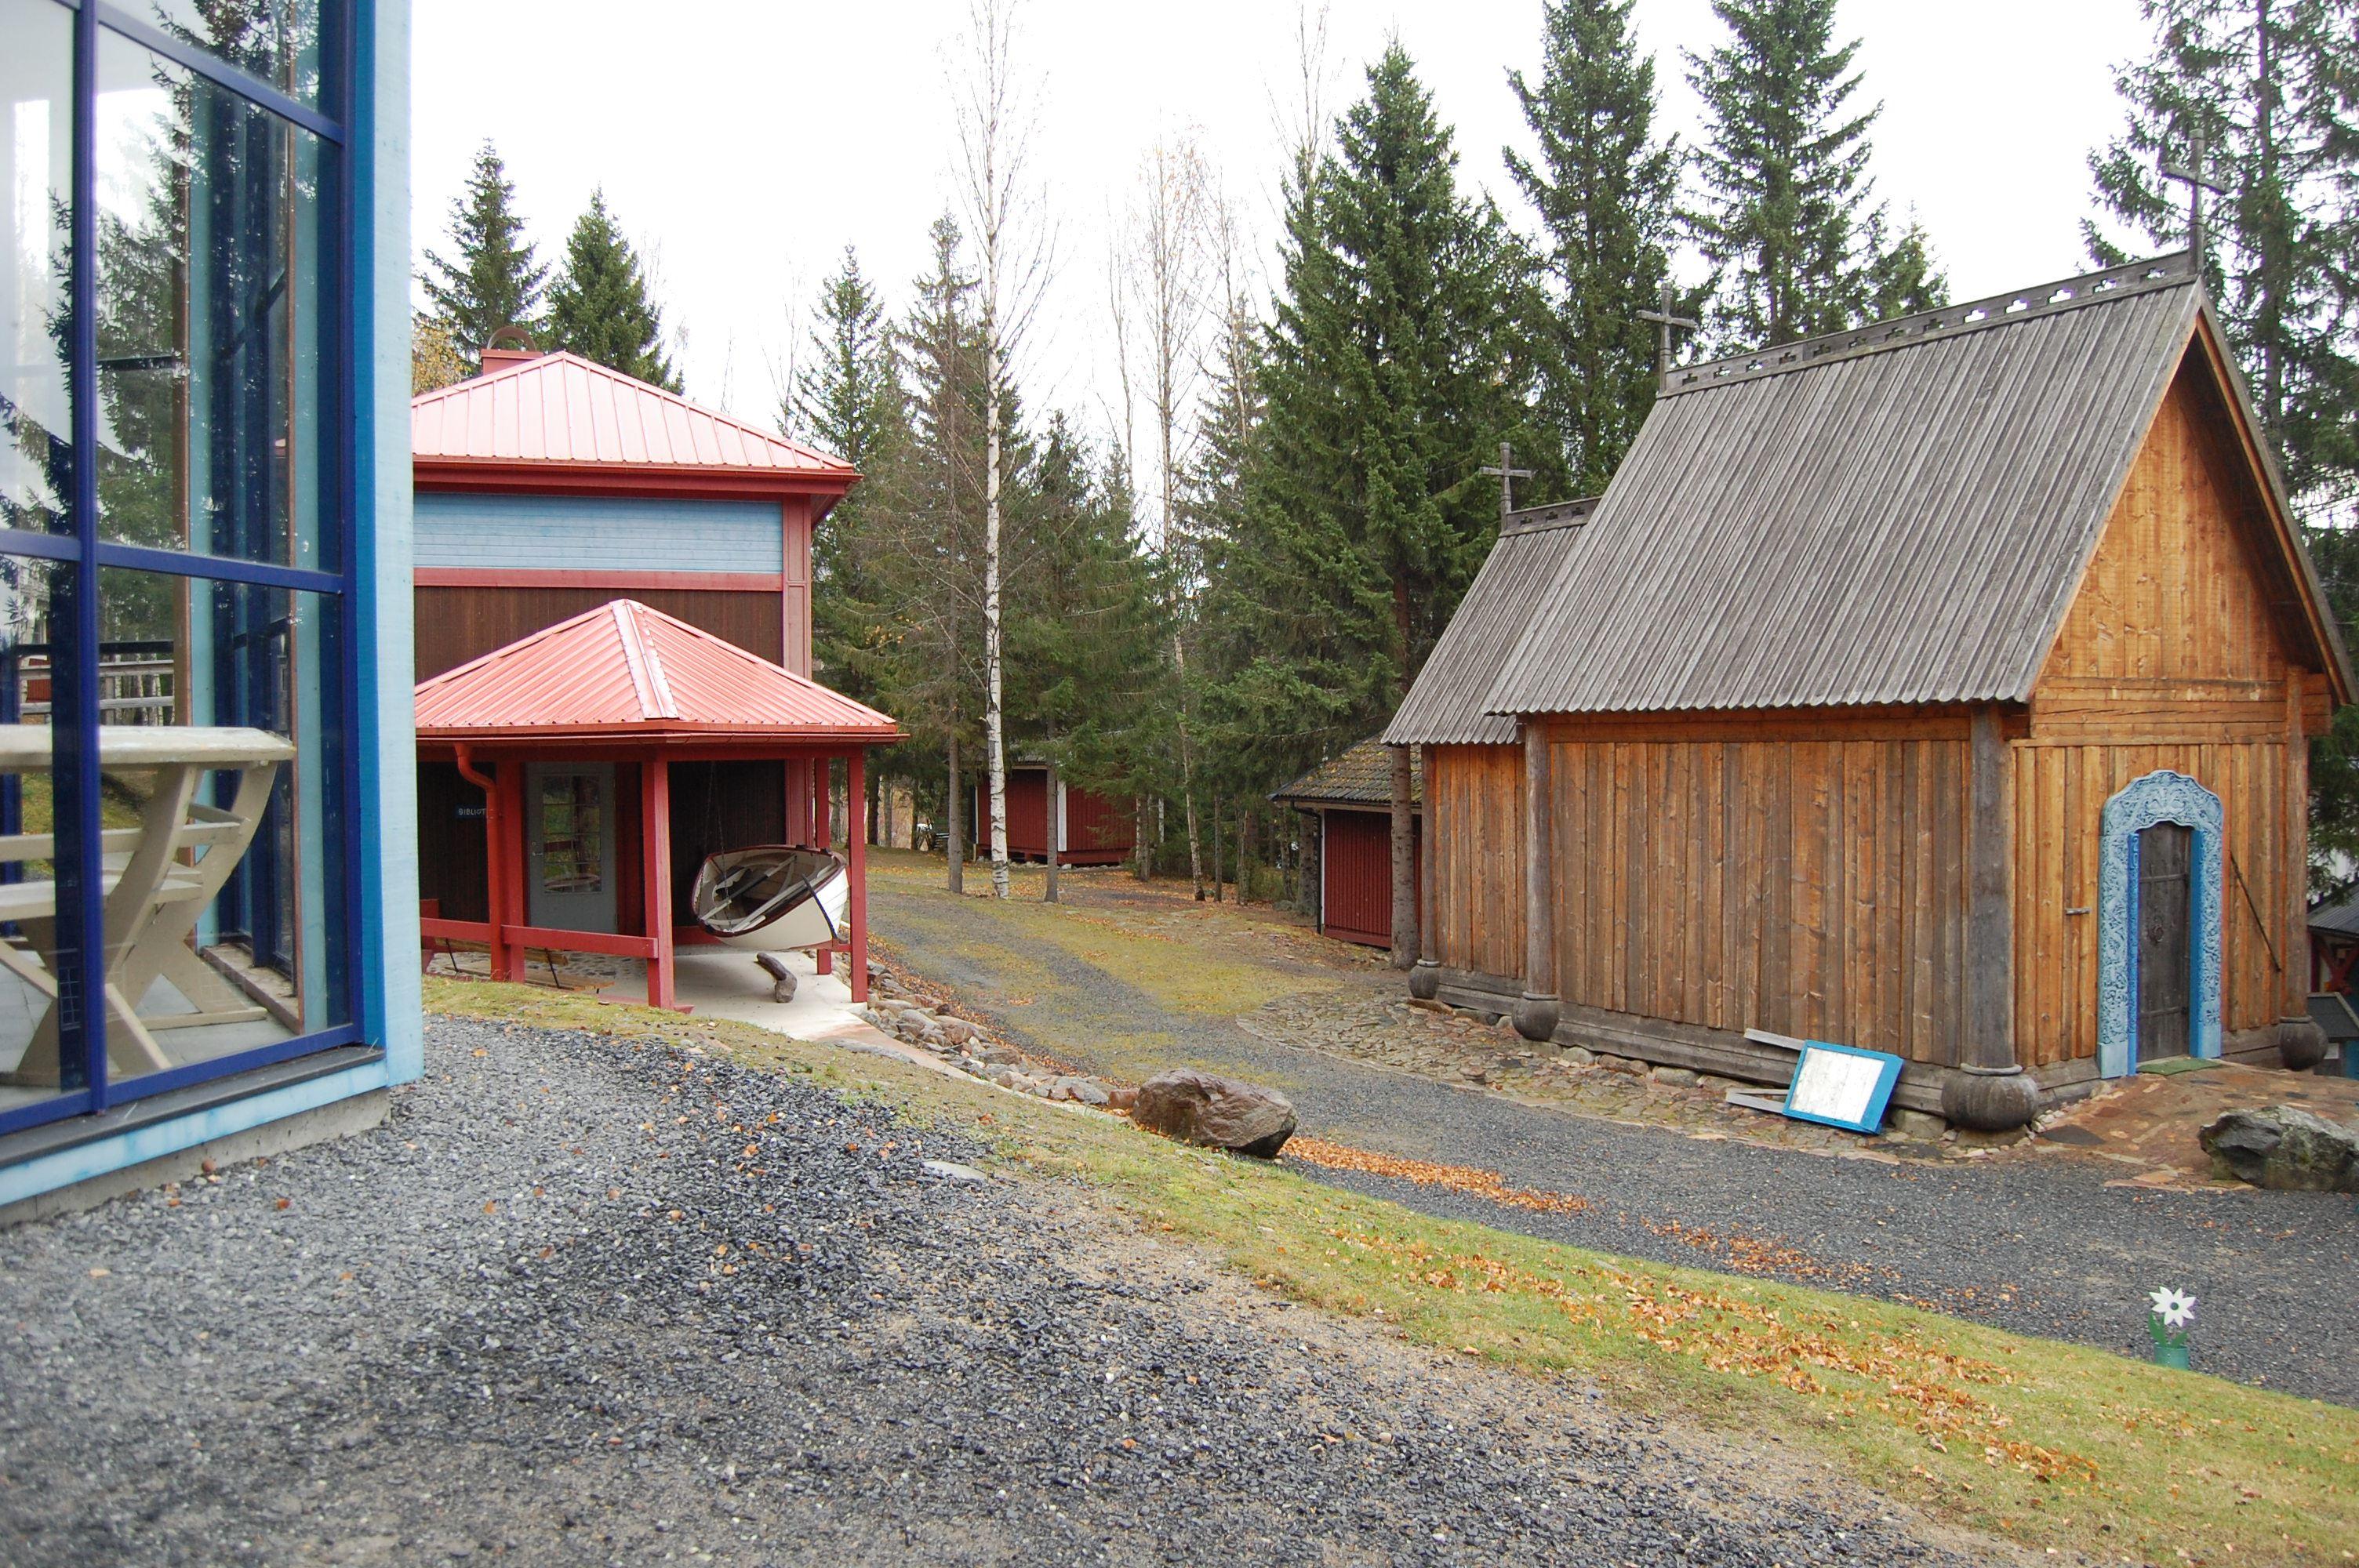 © Kramfors kommun, Mannaminne stavkyrka